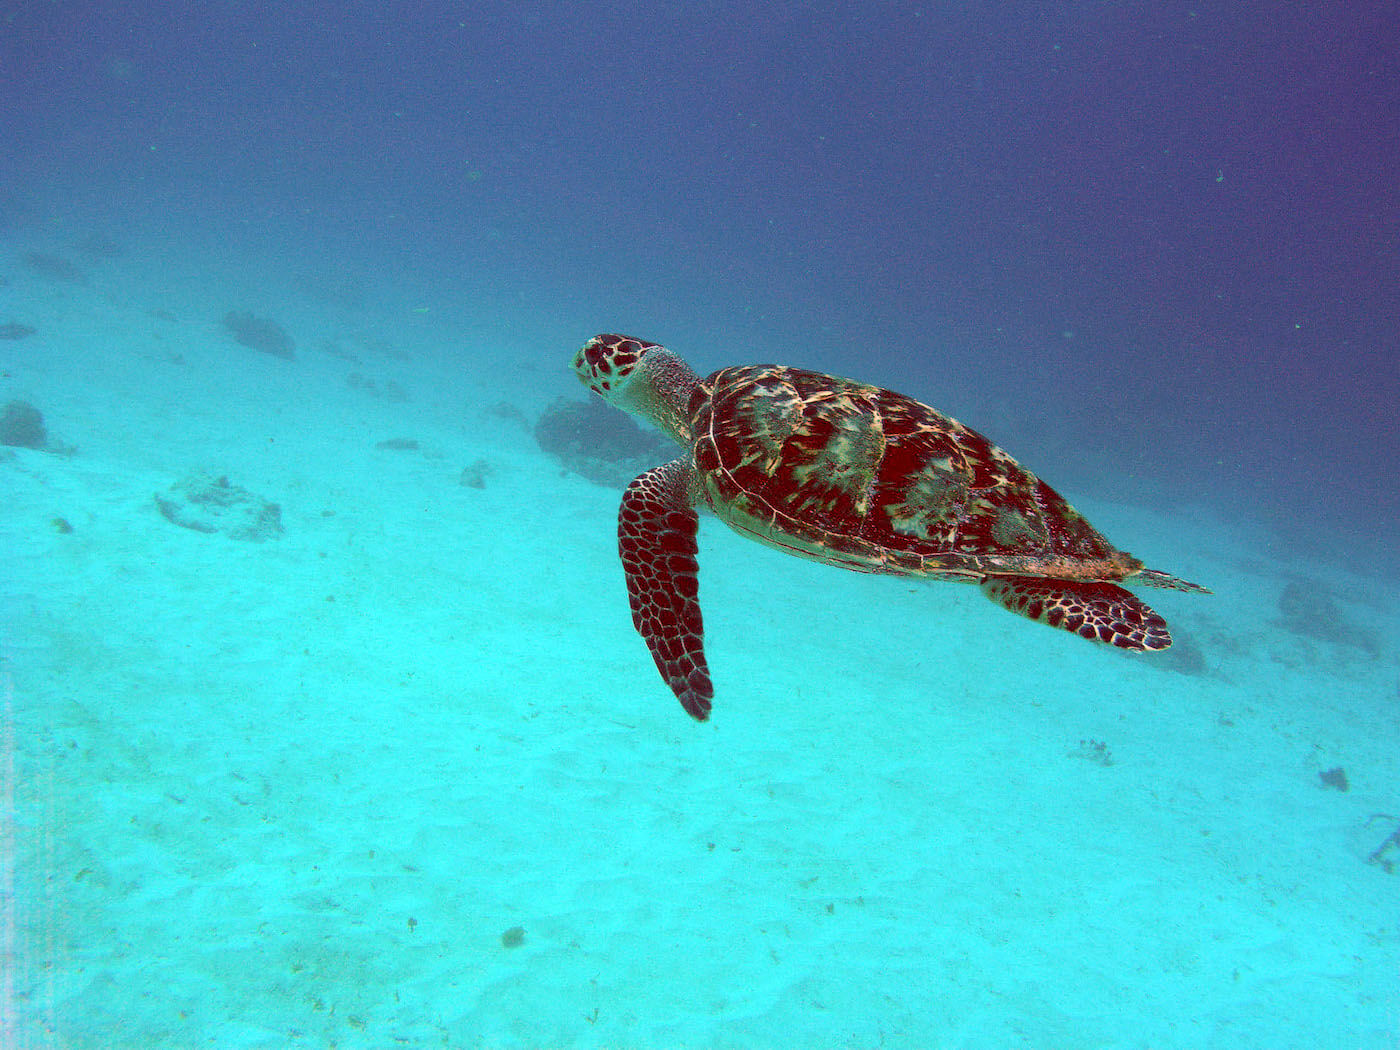 Isla Mujeres Sea Turtle Snorkeling Scuba Diving Squalo Adventures-4